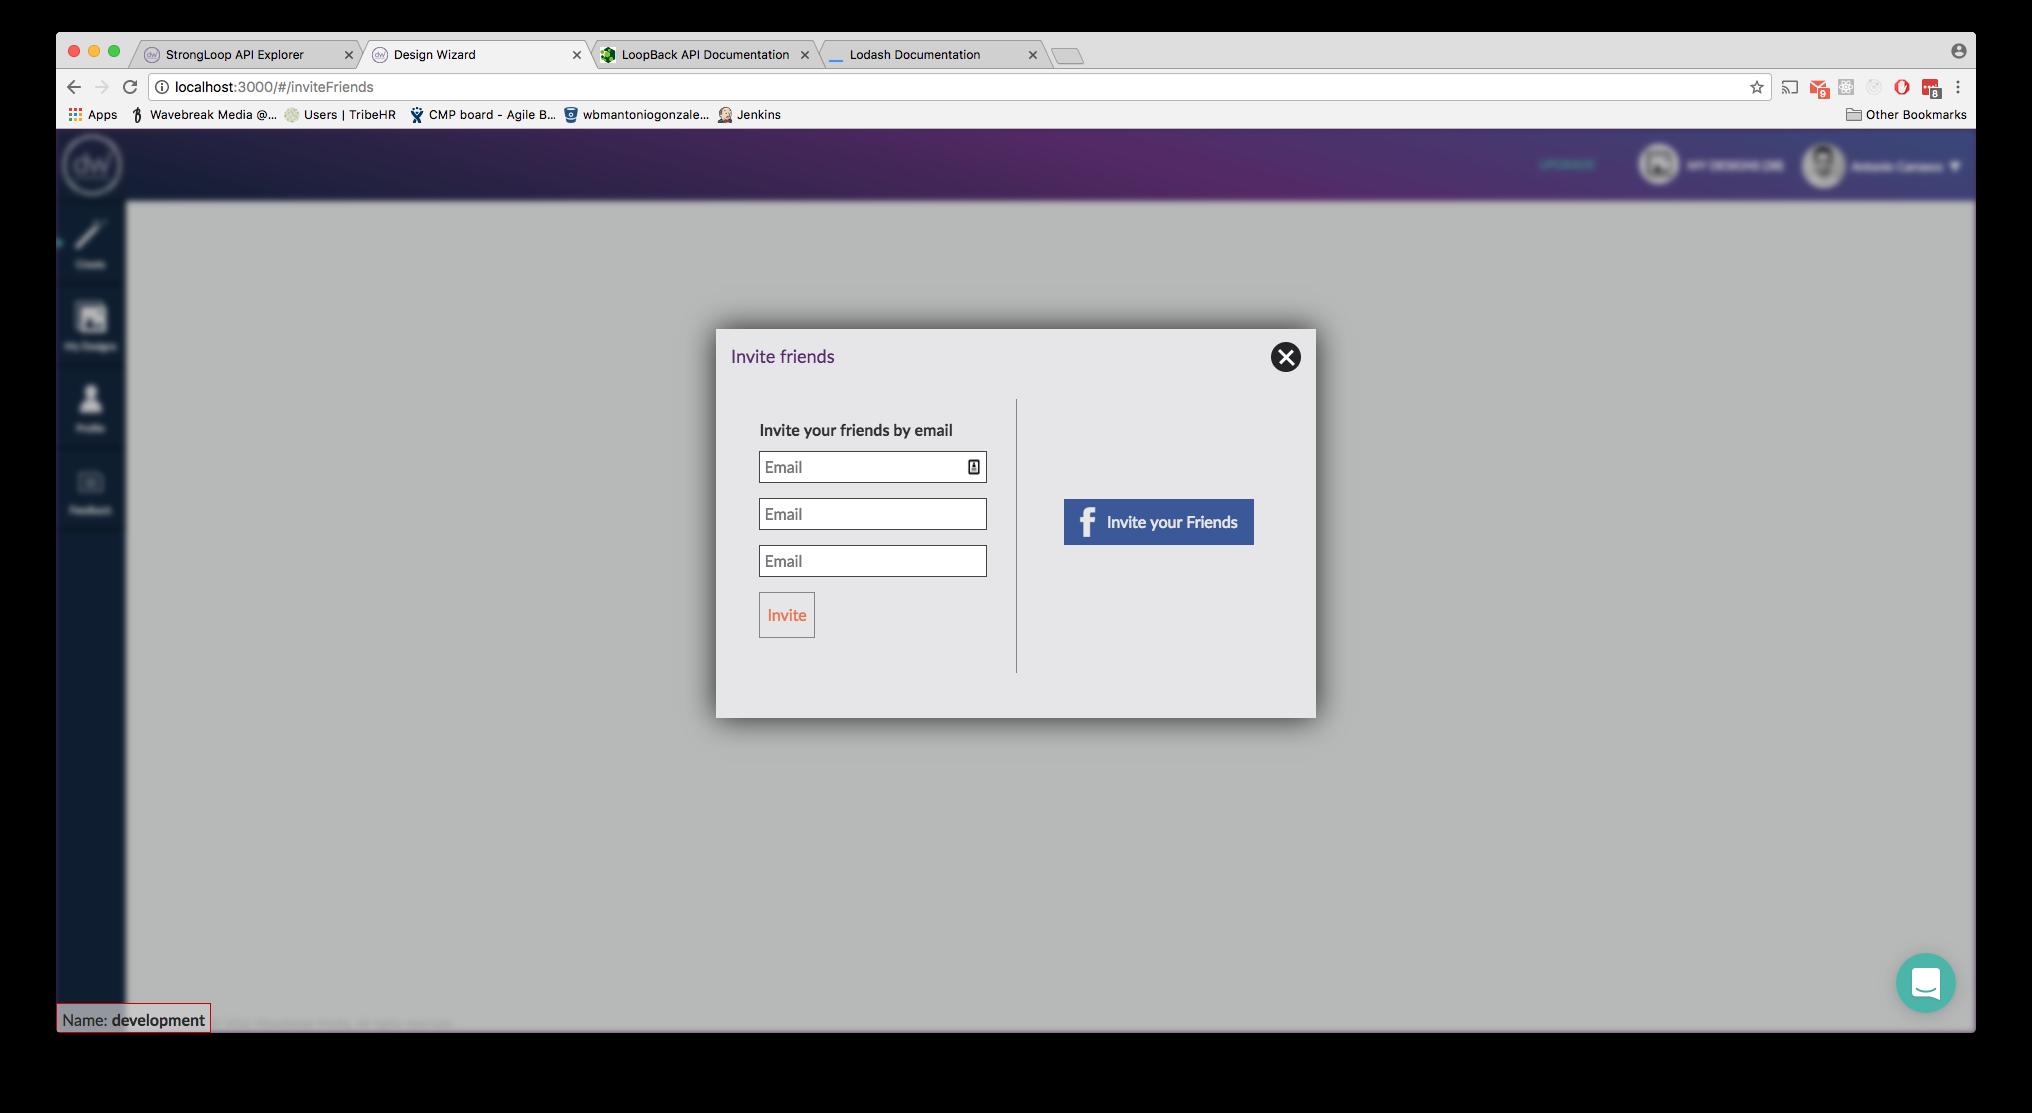 Design Wizard Demo - Share Design Wizard To Unlock Designs